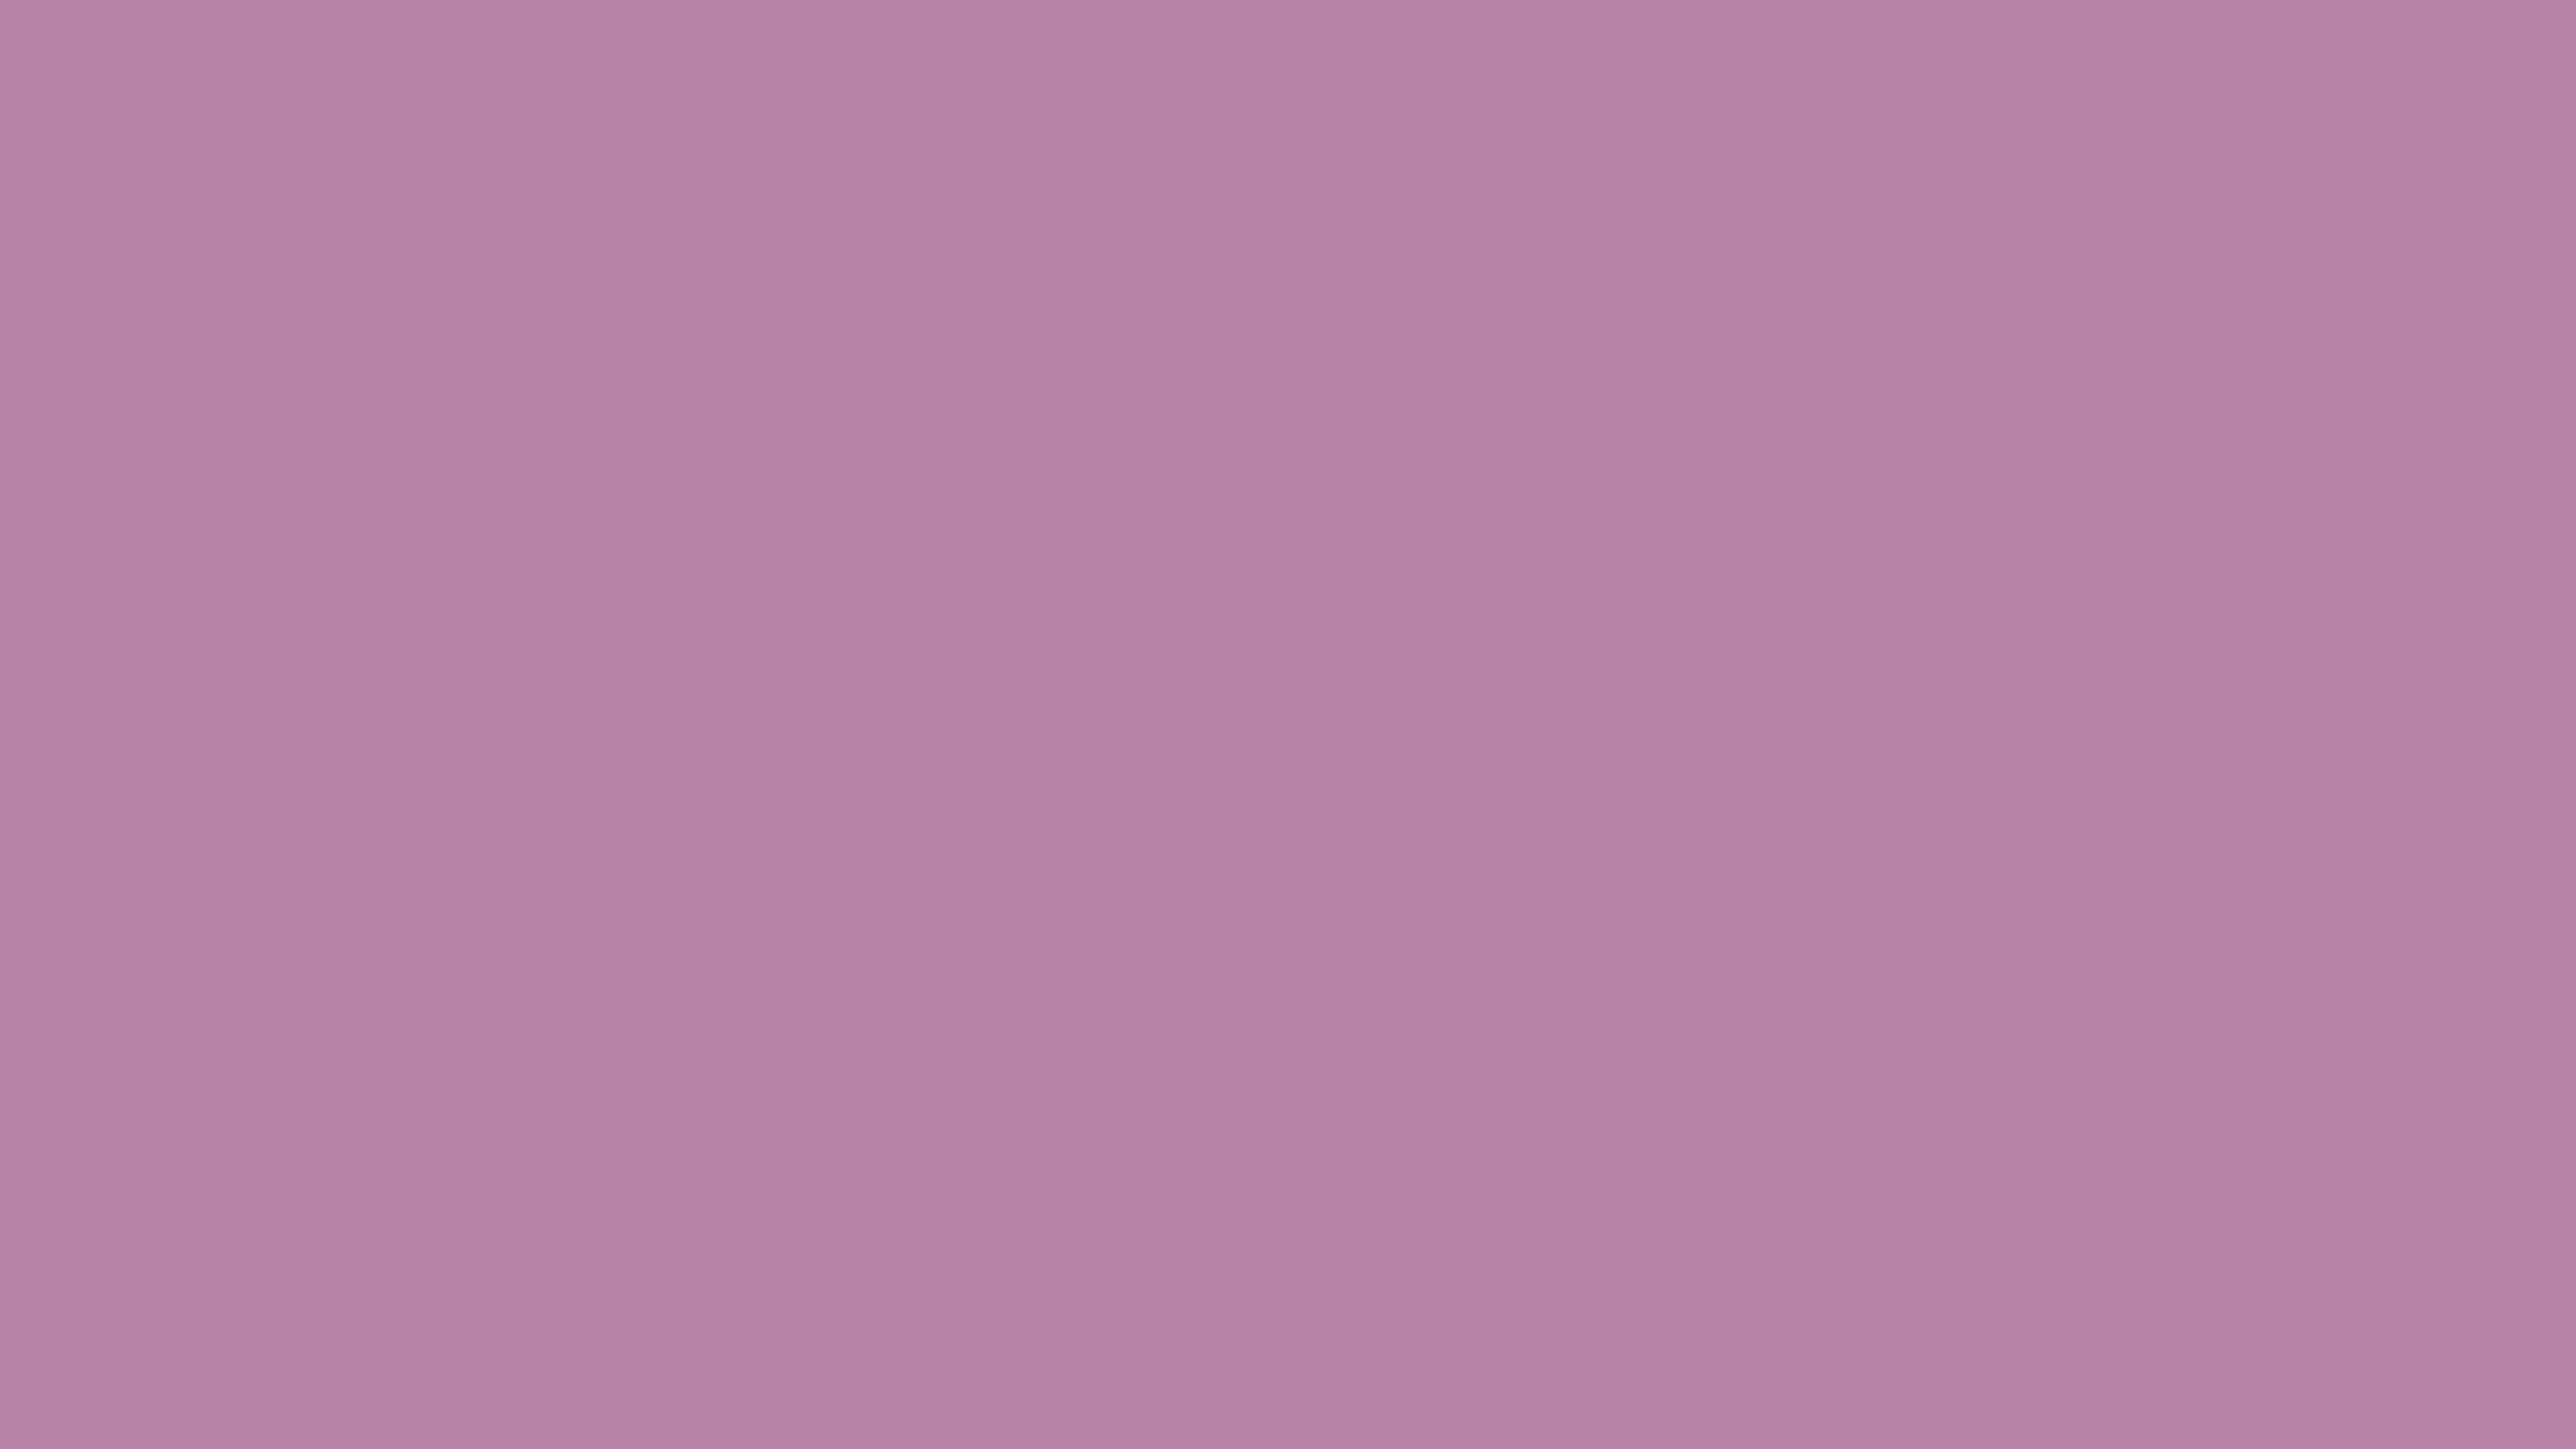 4096x2304 Opera Mauve Solid Color Background